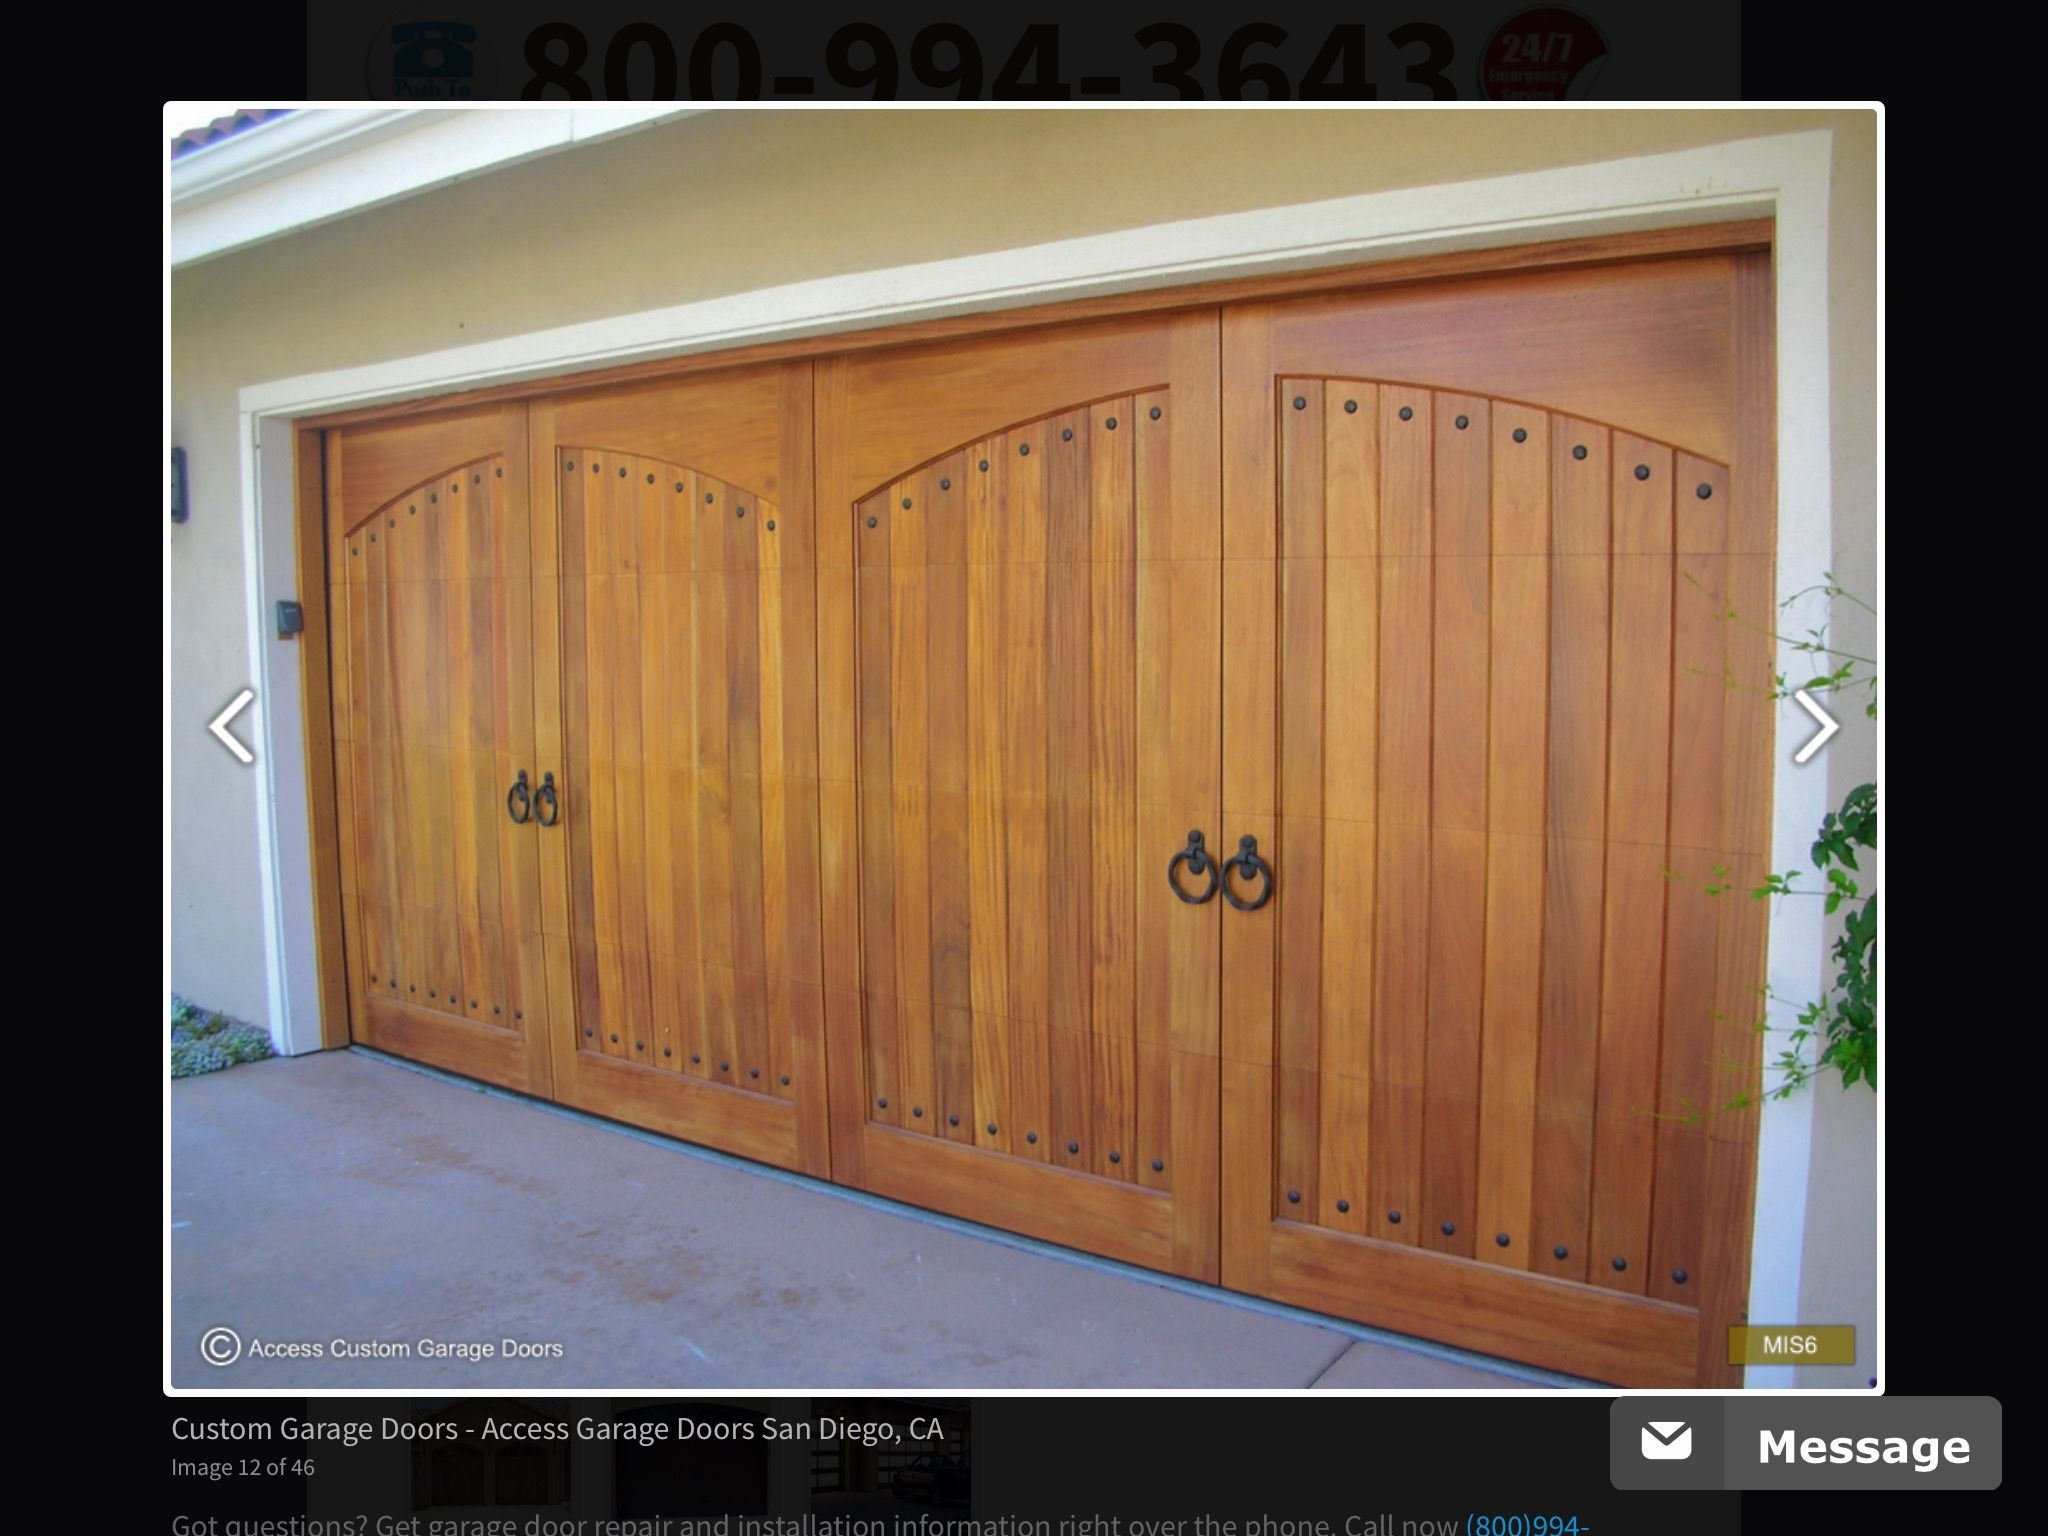 Garage door windows that open  Pin by Mike L on Arches Doors u Windows  Pinterest  Arch Doors